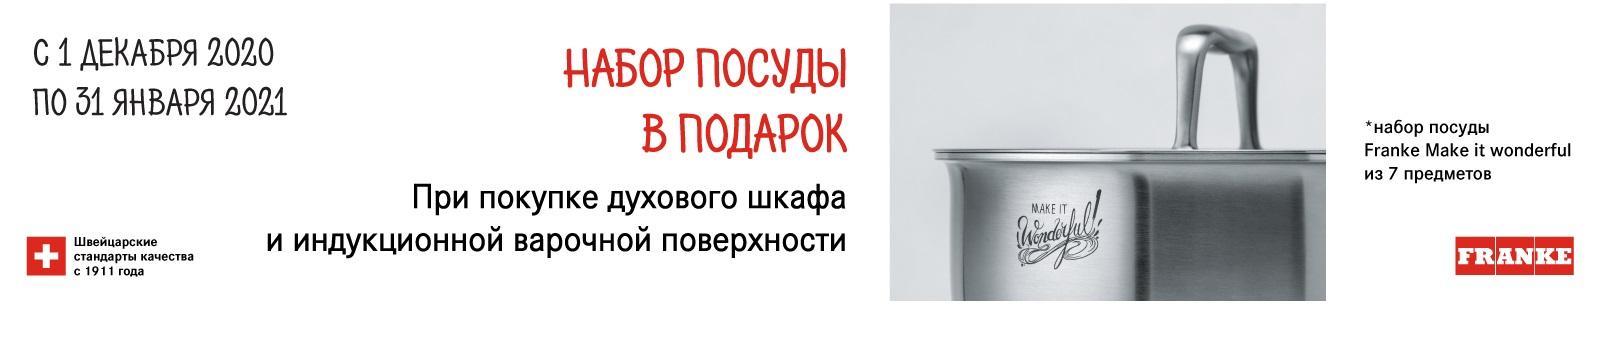 !!!!tablewaregift_franke_2020-21_new_1600x300